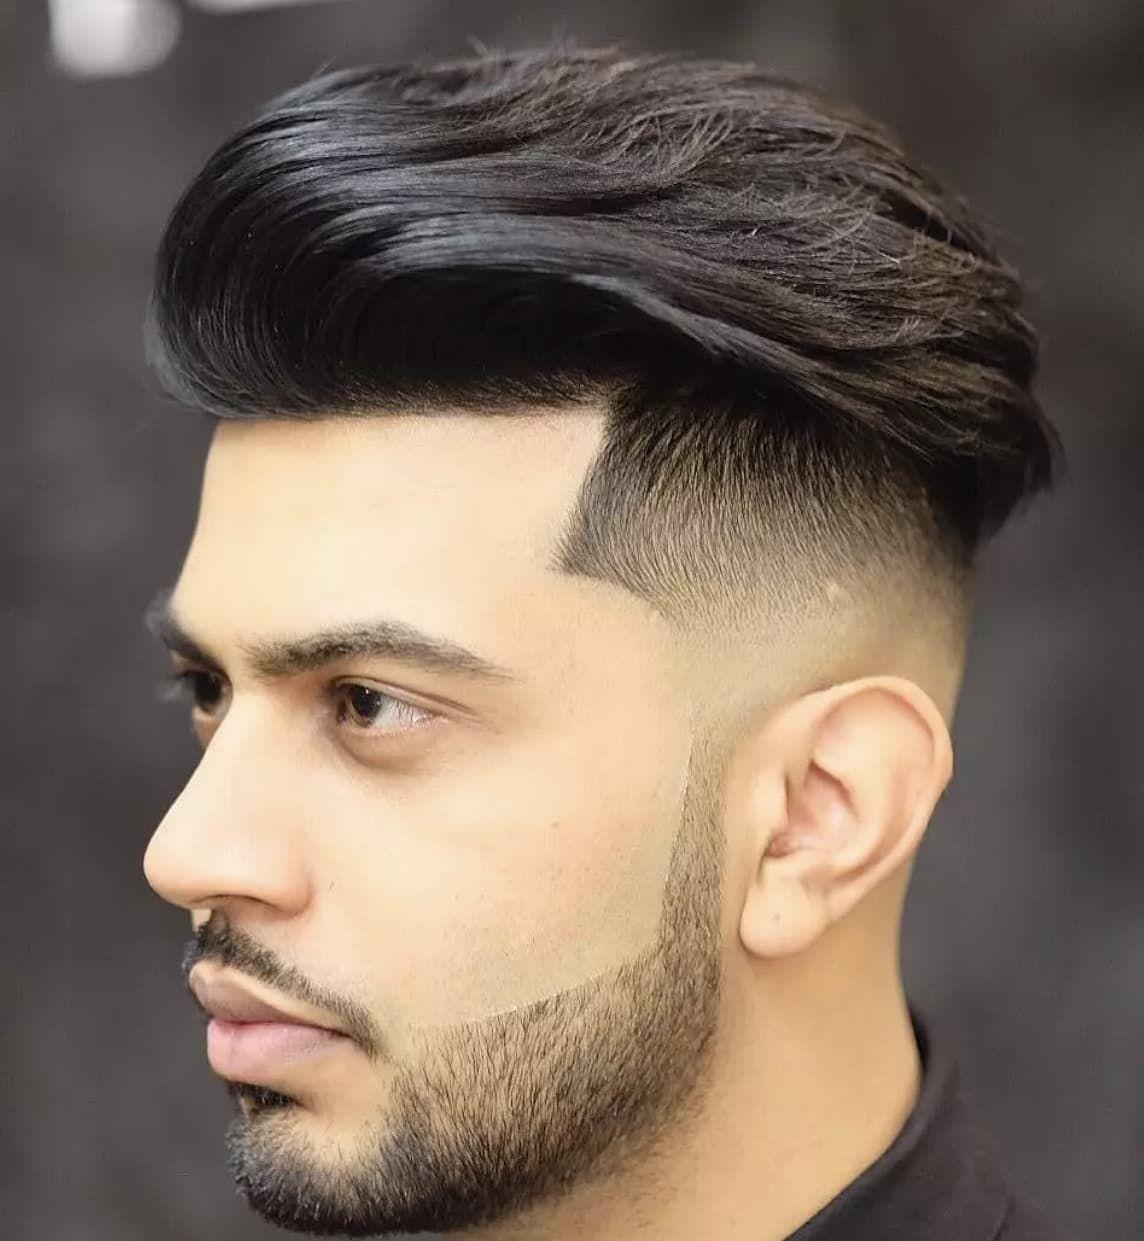 Best Undercut Fade Hairstyles Undercut Fade Hairstyle Undercut